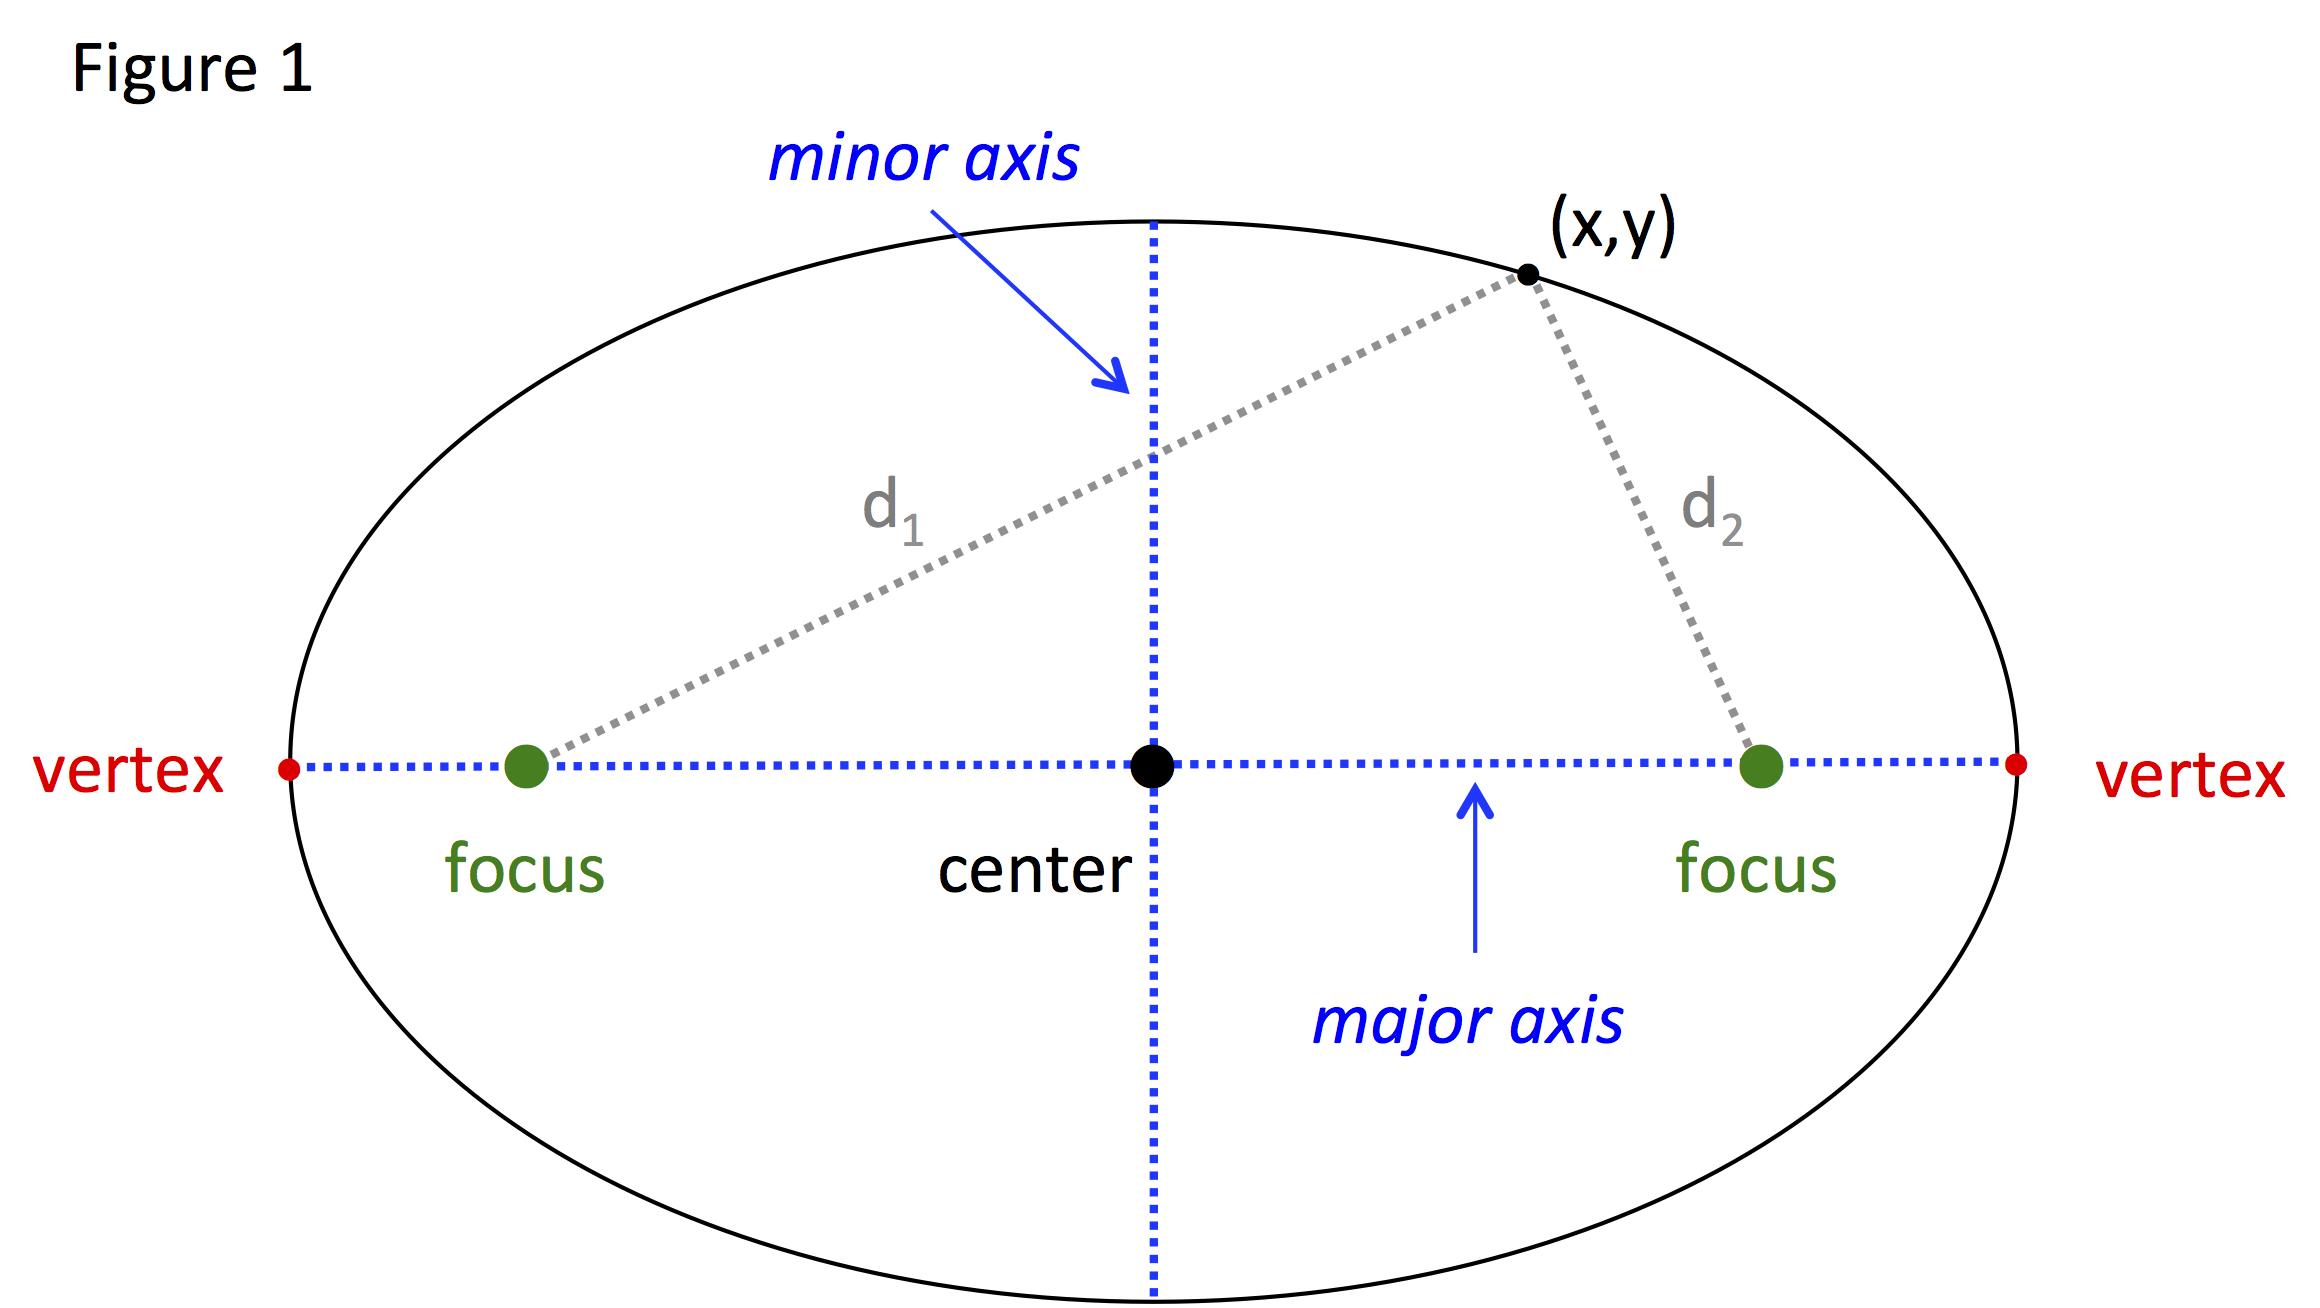 conic sections diagram influenza venn ellipse standard equation